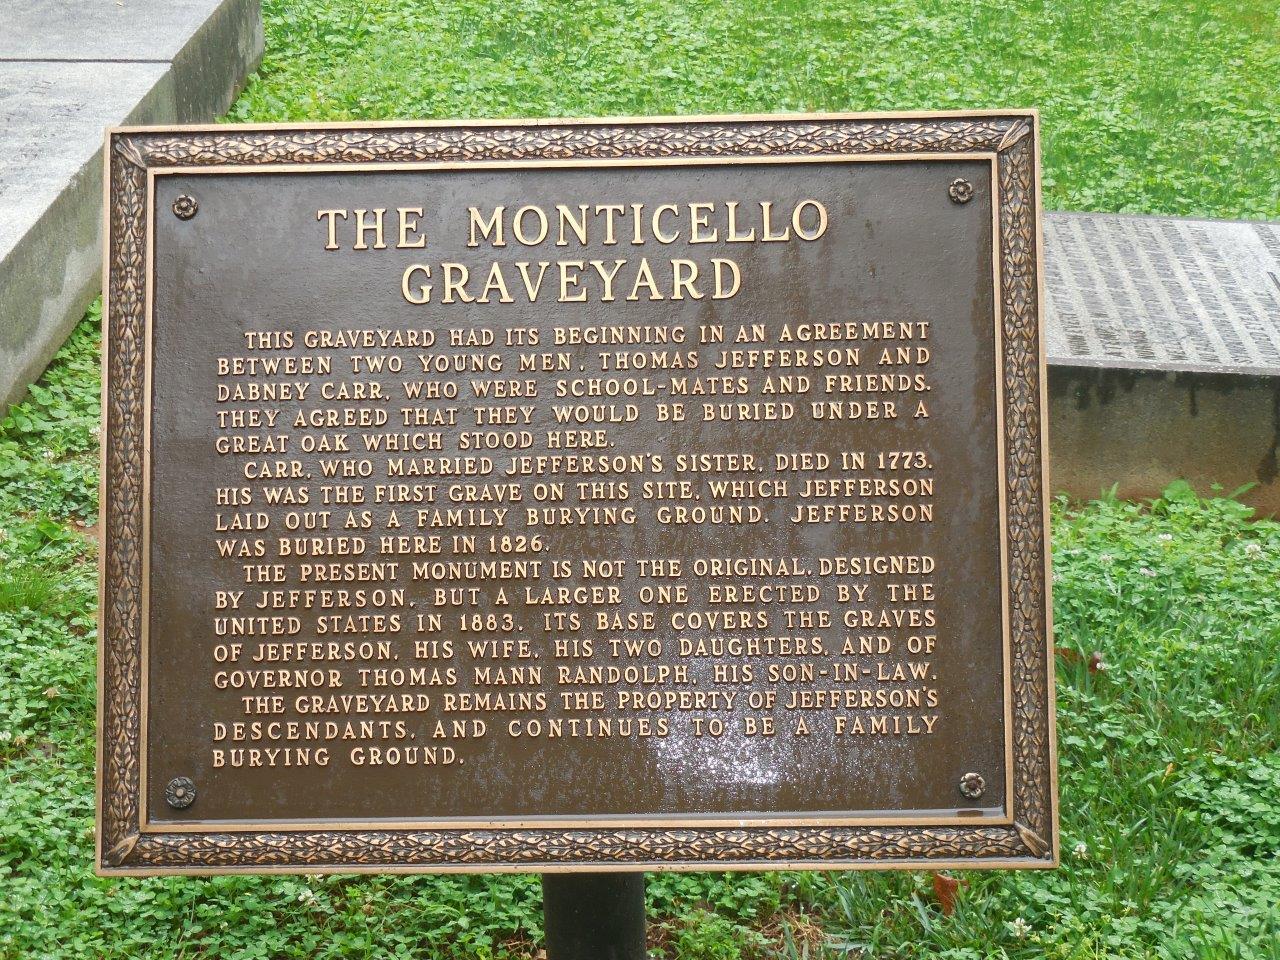 historical marker at Thomas Jefferson gravesite